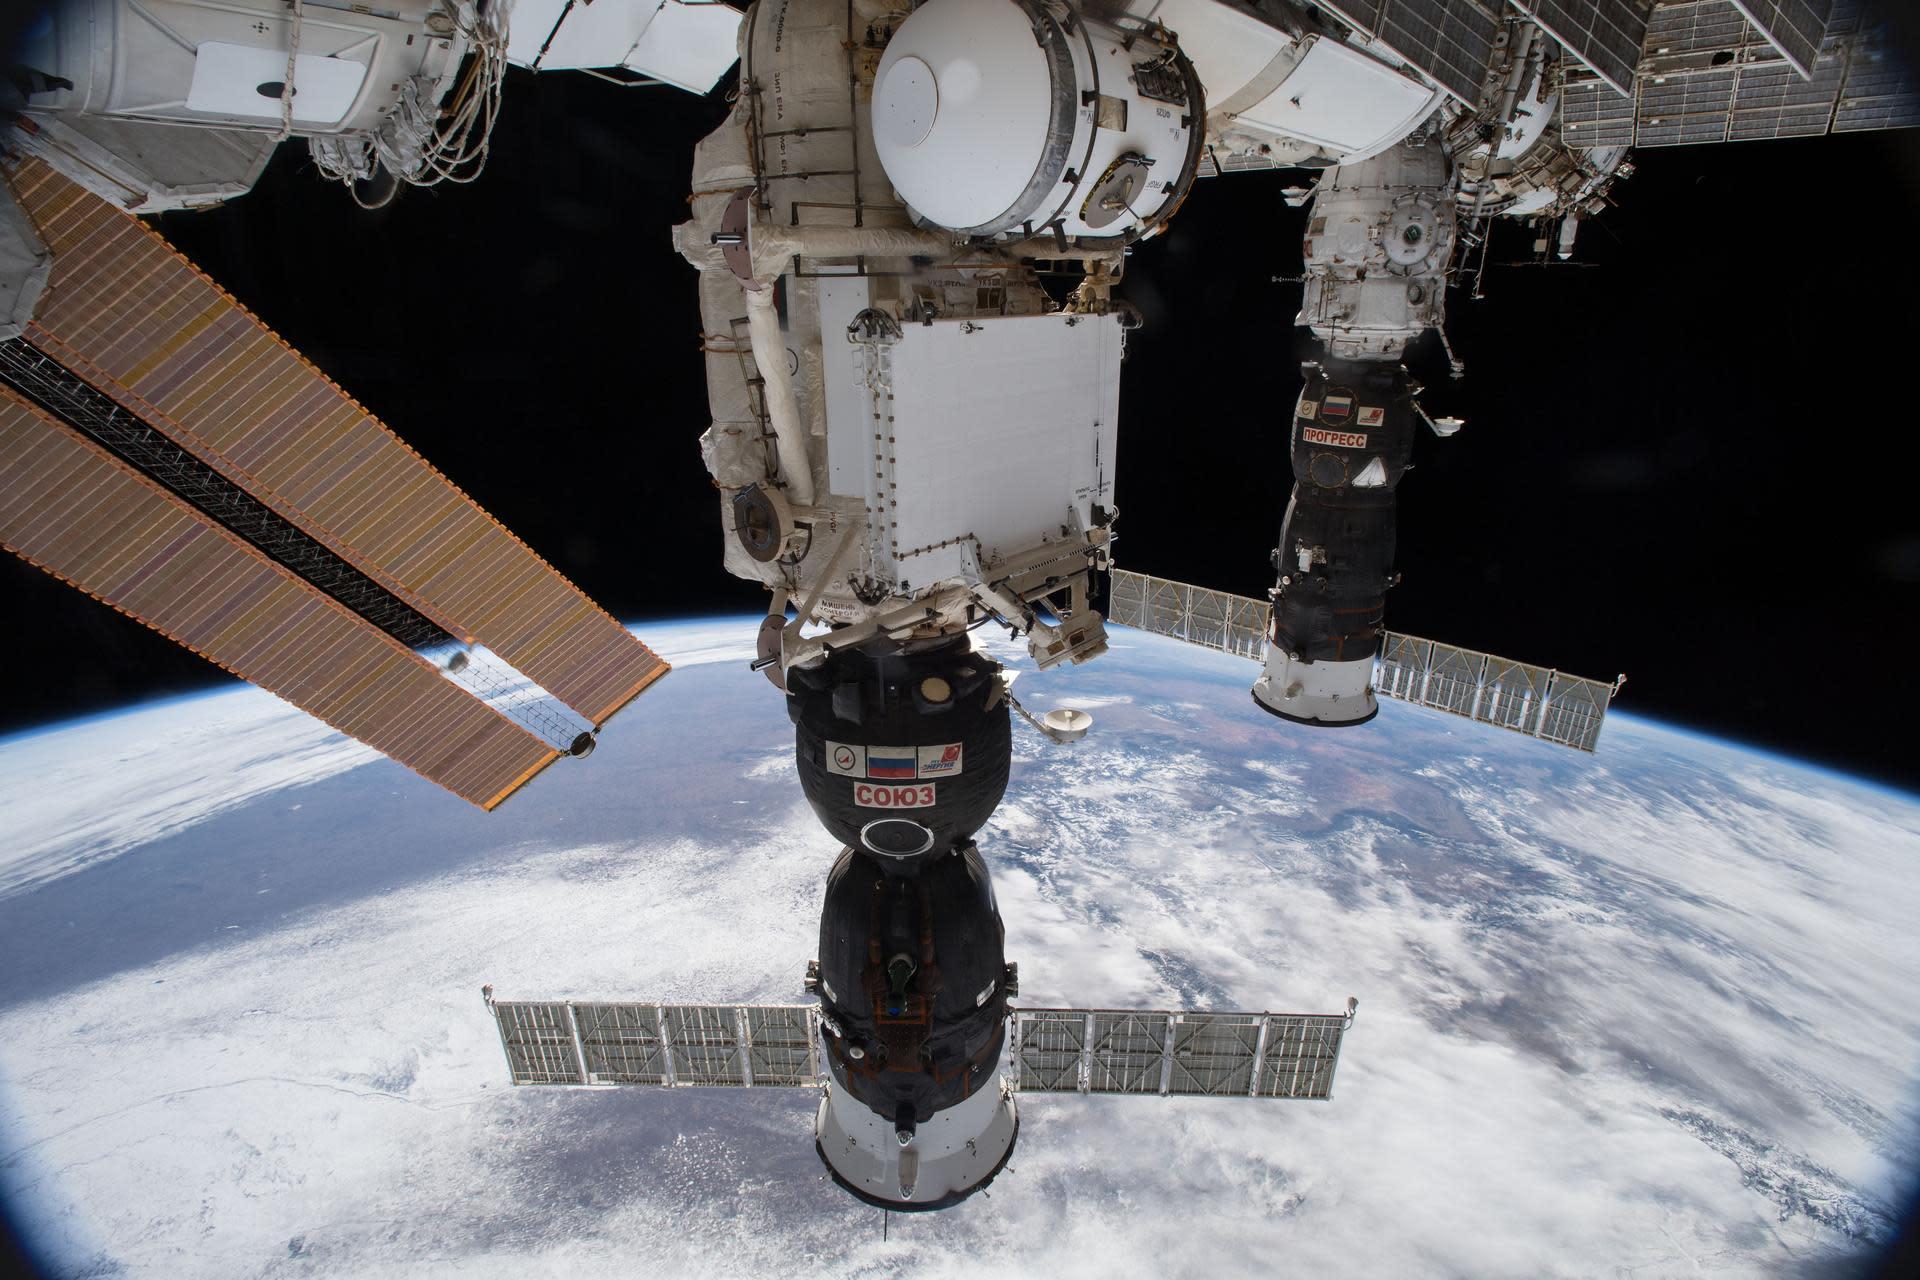 international space station astronauts return to earth - photo #19